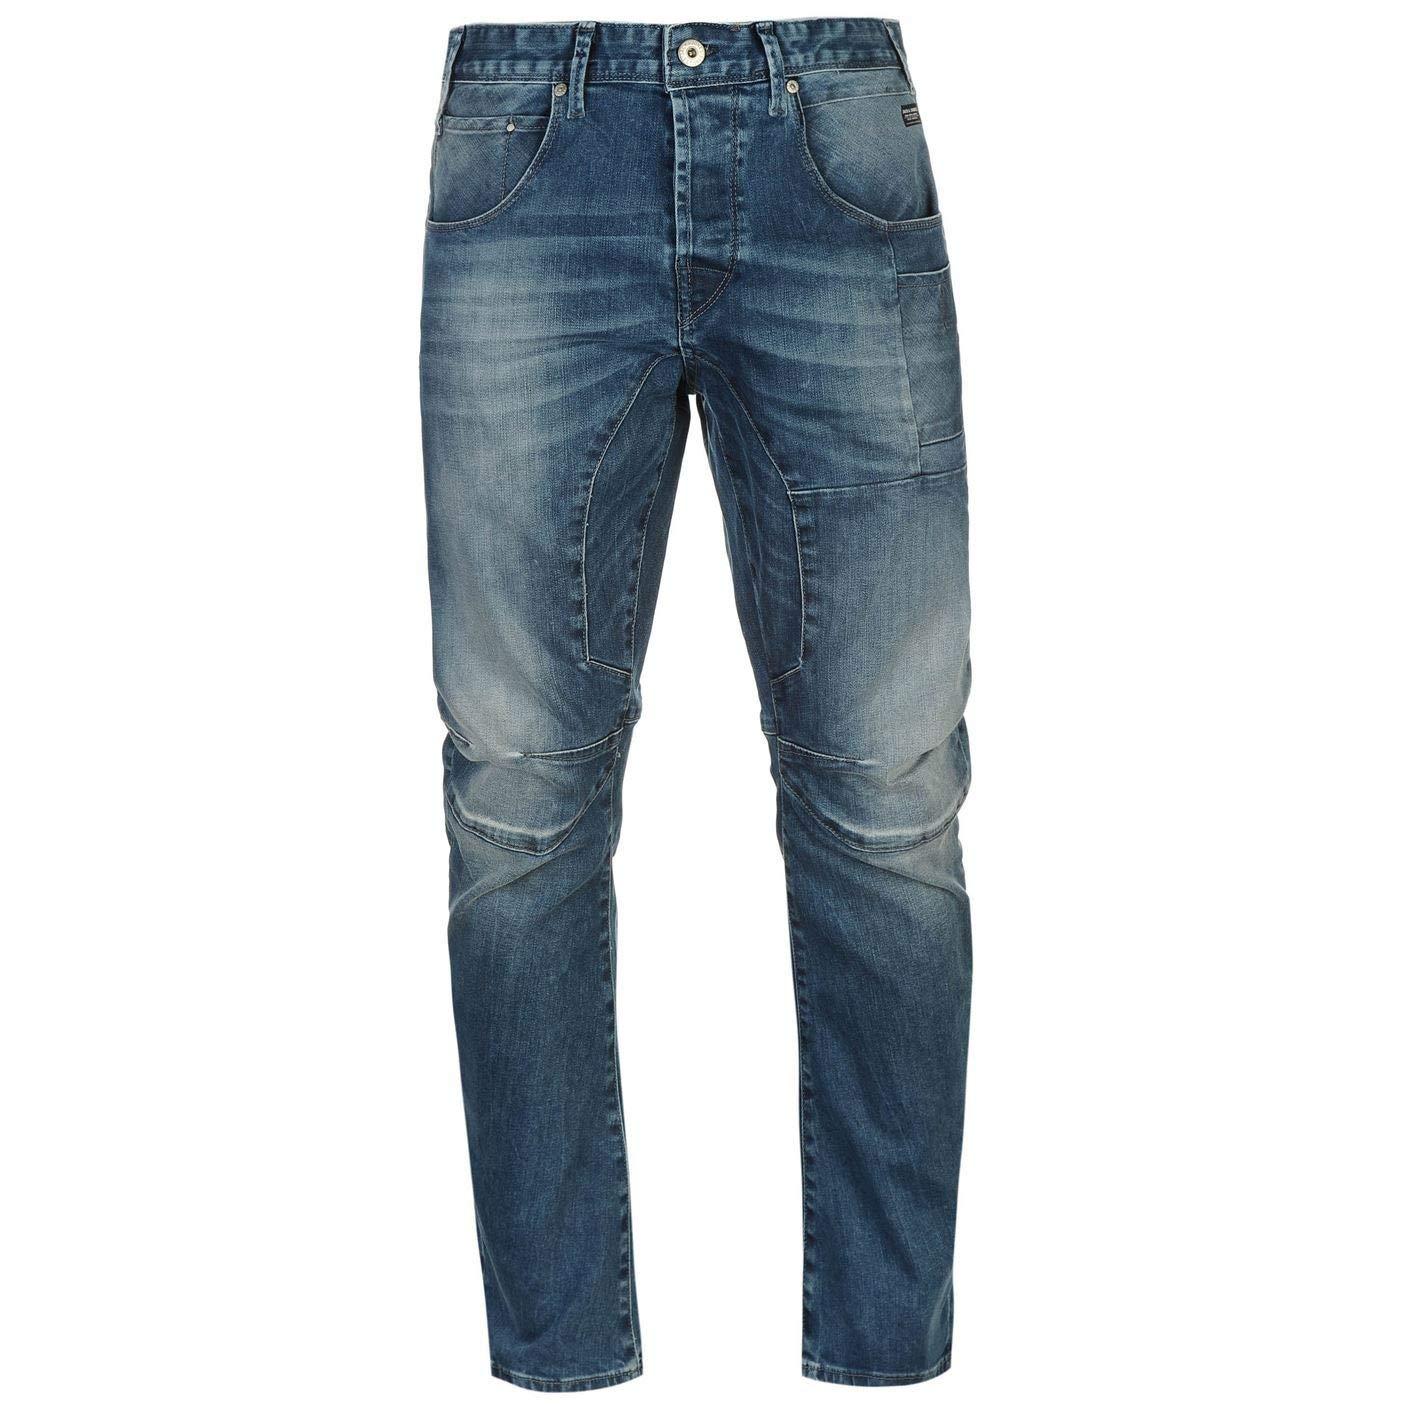 Jeans Denim Jack and Jones Ji Stan Osaka Anti Fit Mens Trouser Pants